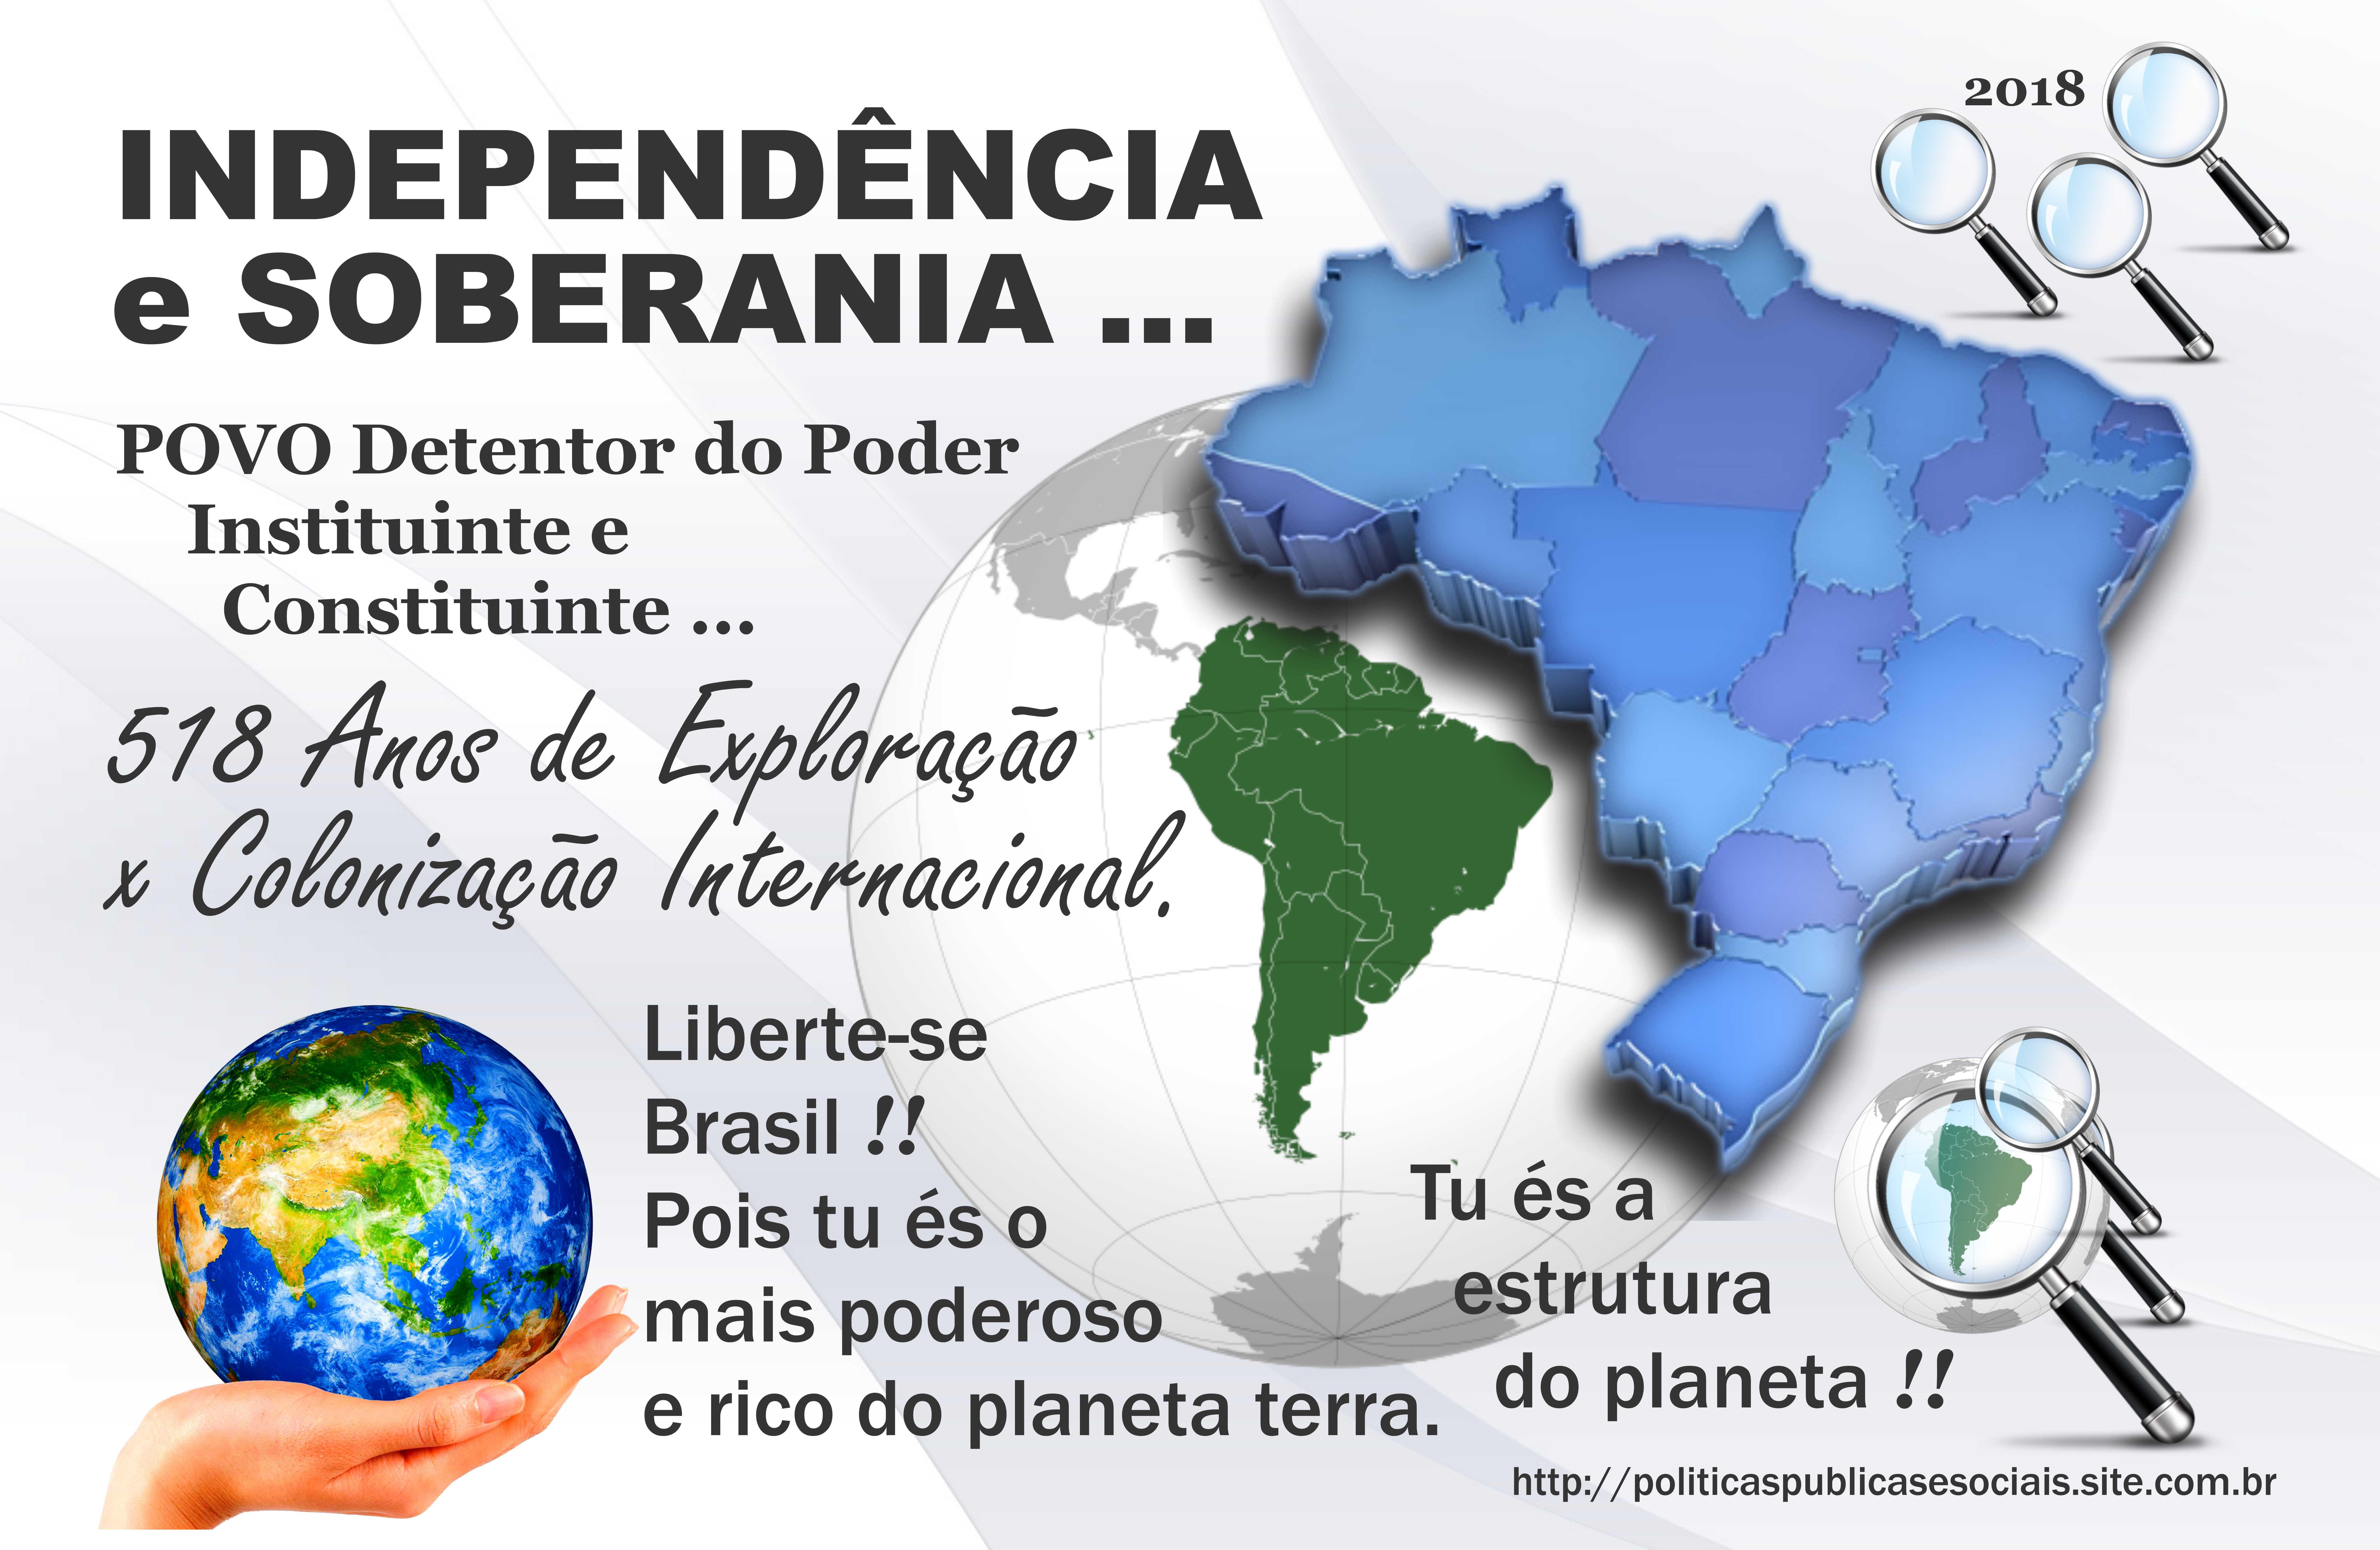 INDEPENDÊNCIA e SOBERANIA BRASIL 01